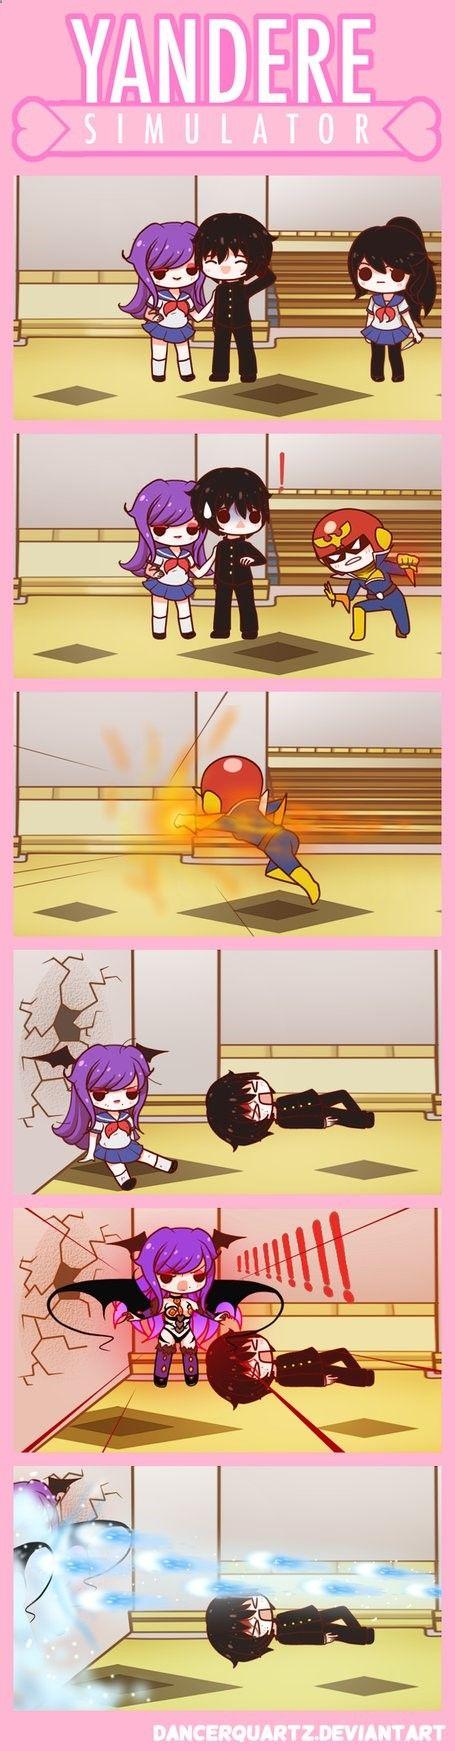 Yandere Comic - Bad Senpai! by DancerQuartz on DeviantArt ➦ http://www.diverint.com/imagenes-divertidas-para-facebook-dinero-jugando-al-escondite